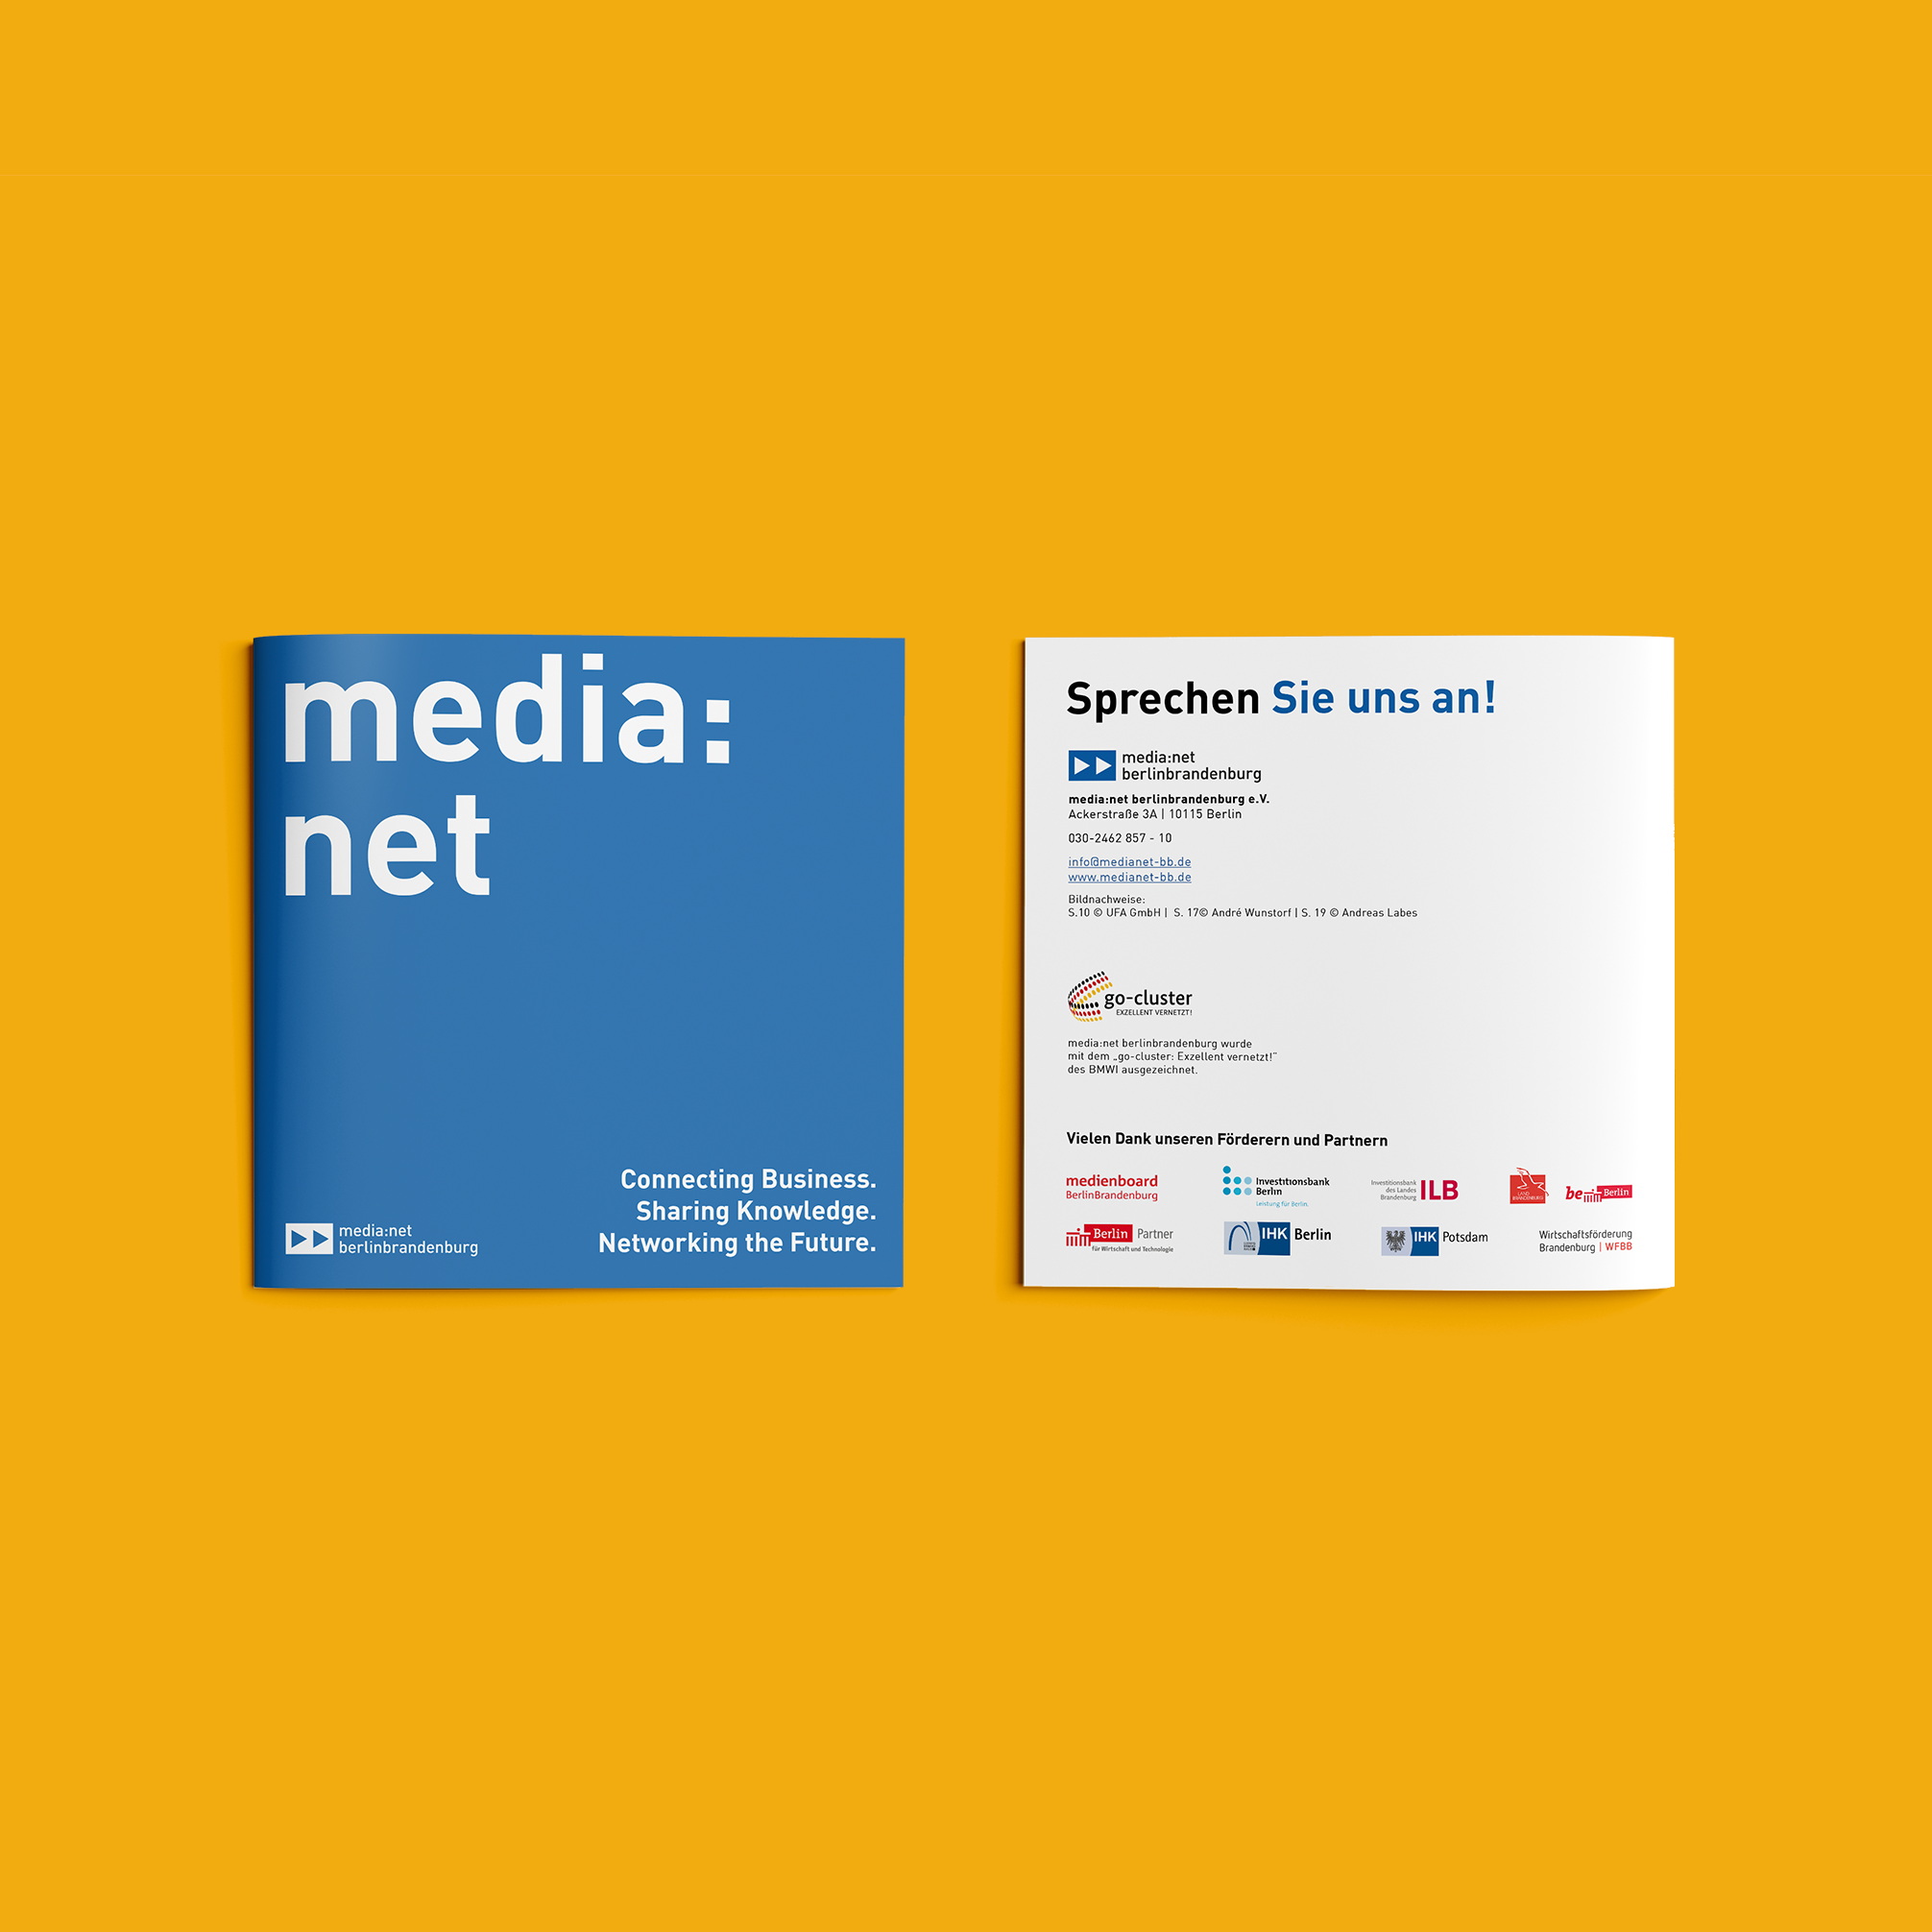 Media net berlinbrandenburg Image Broschüre   Redesign Corporate Design - Cover